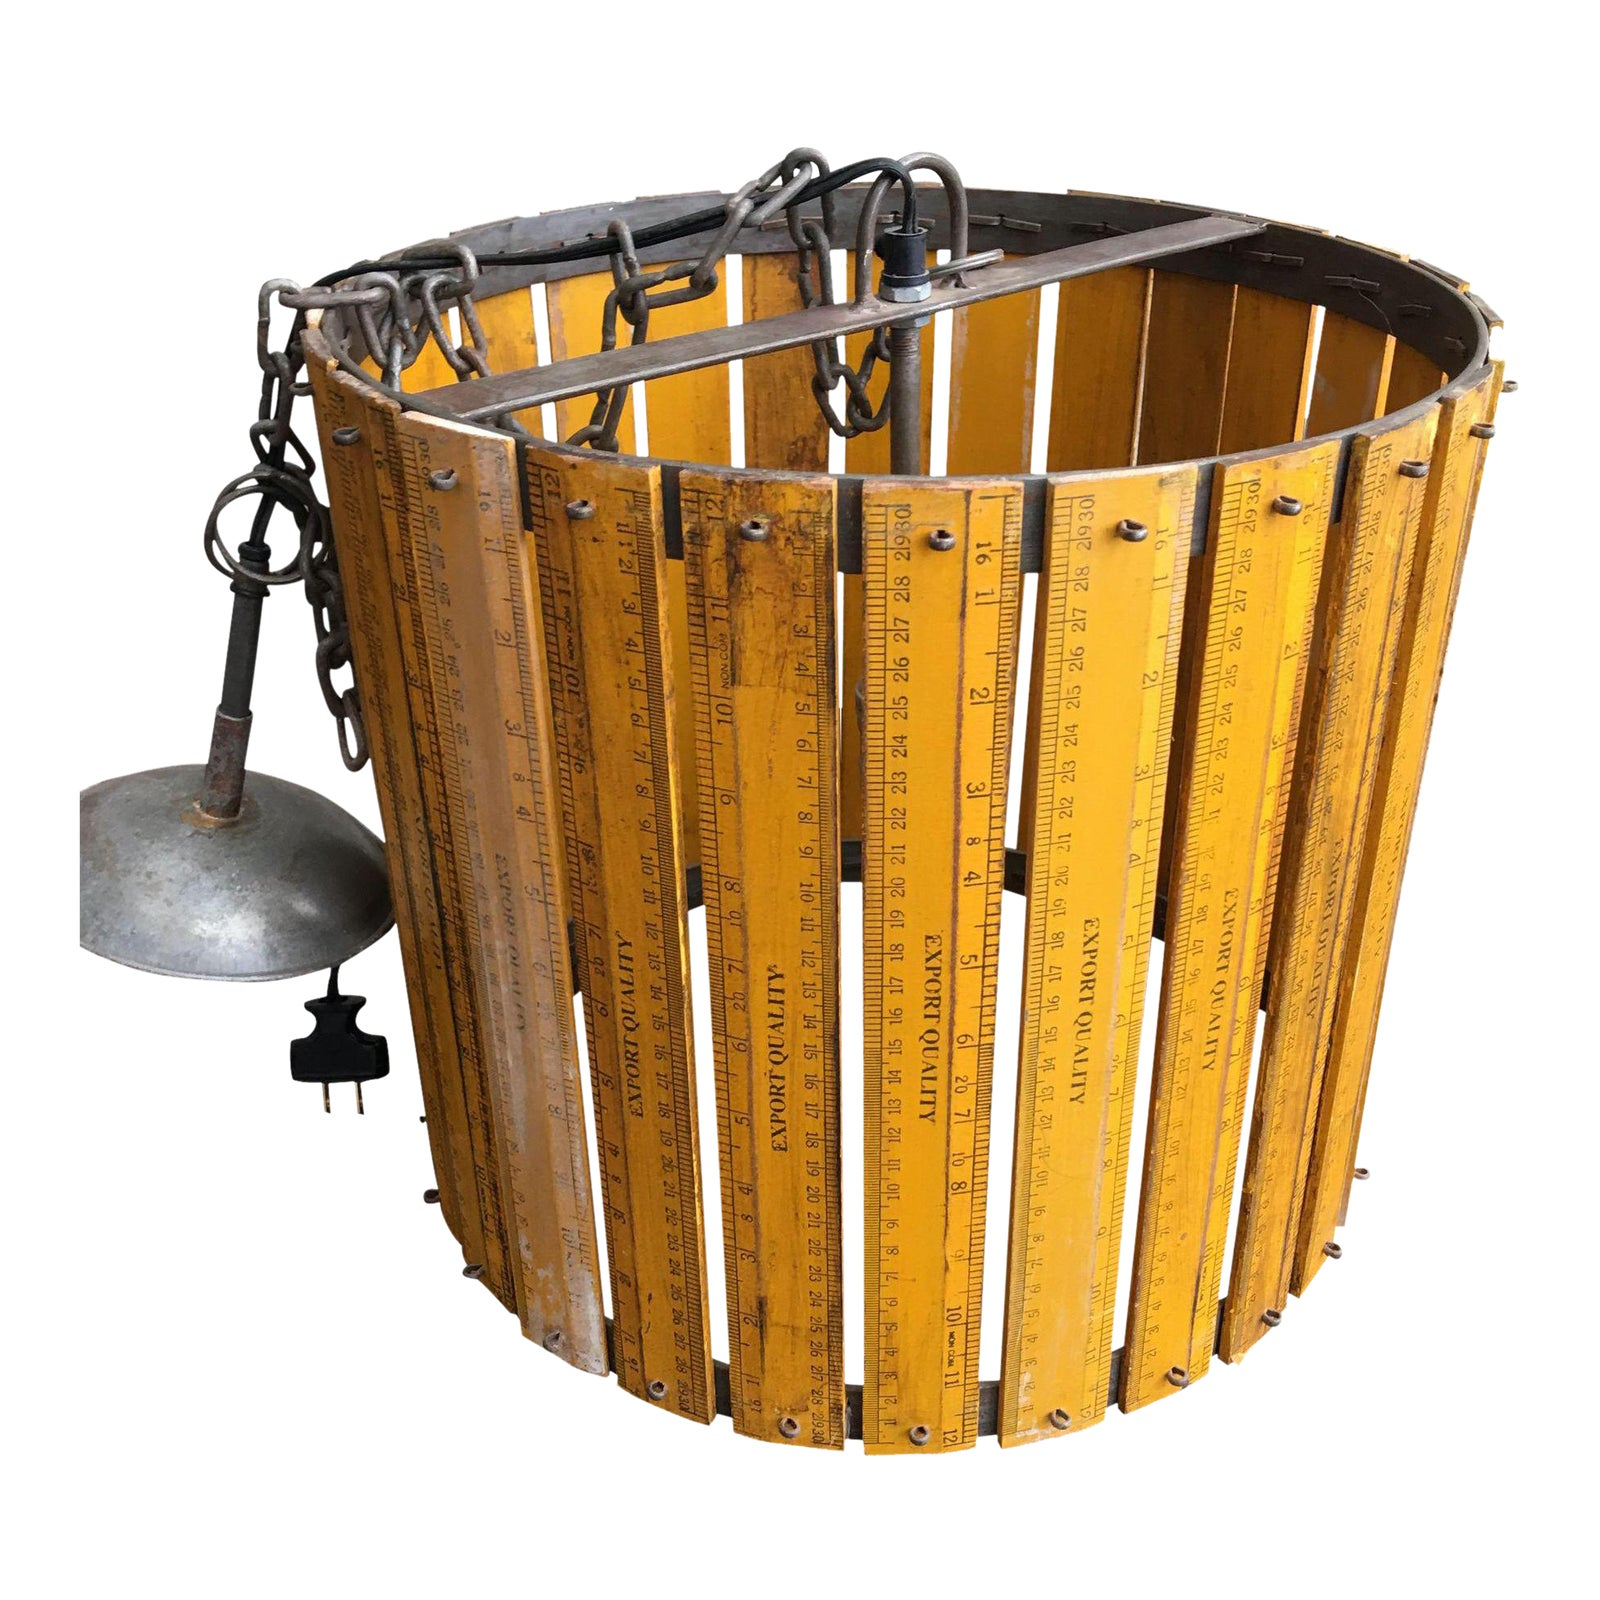 Vintage Industrial Schoolhouse Ruler Drum Light Fixture